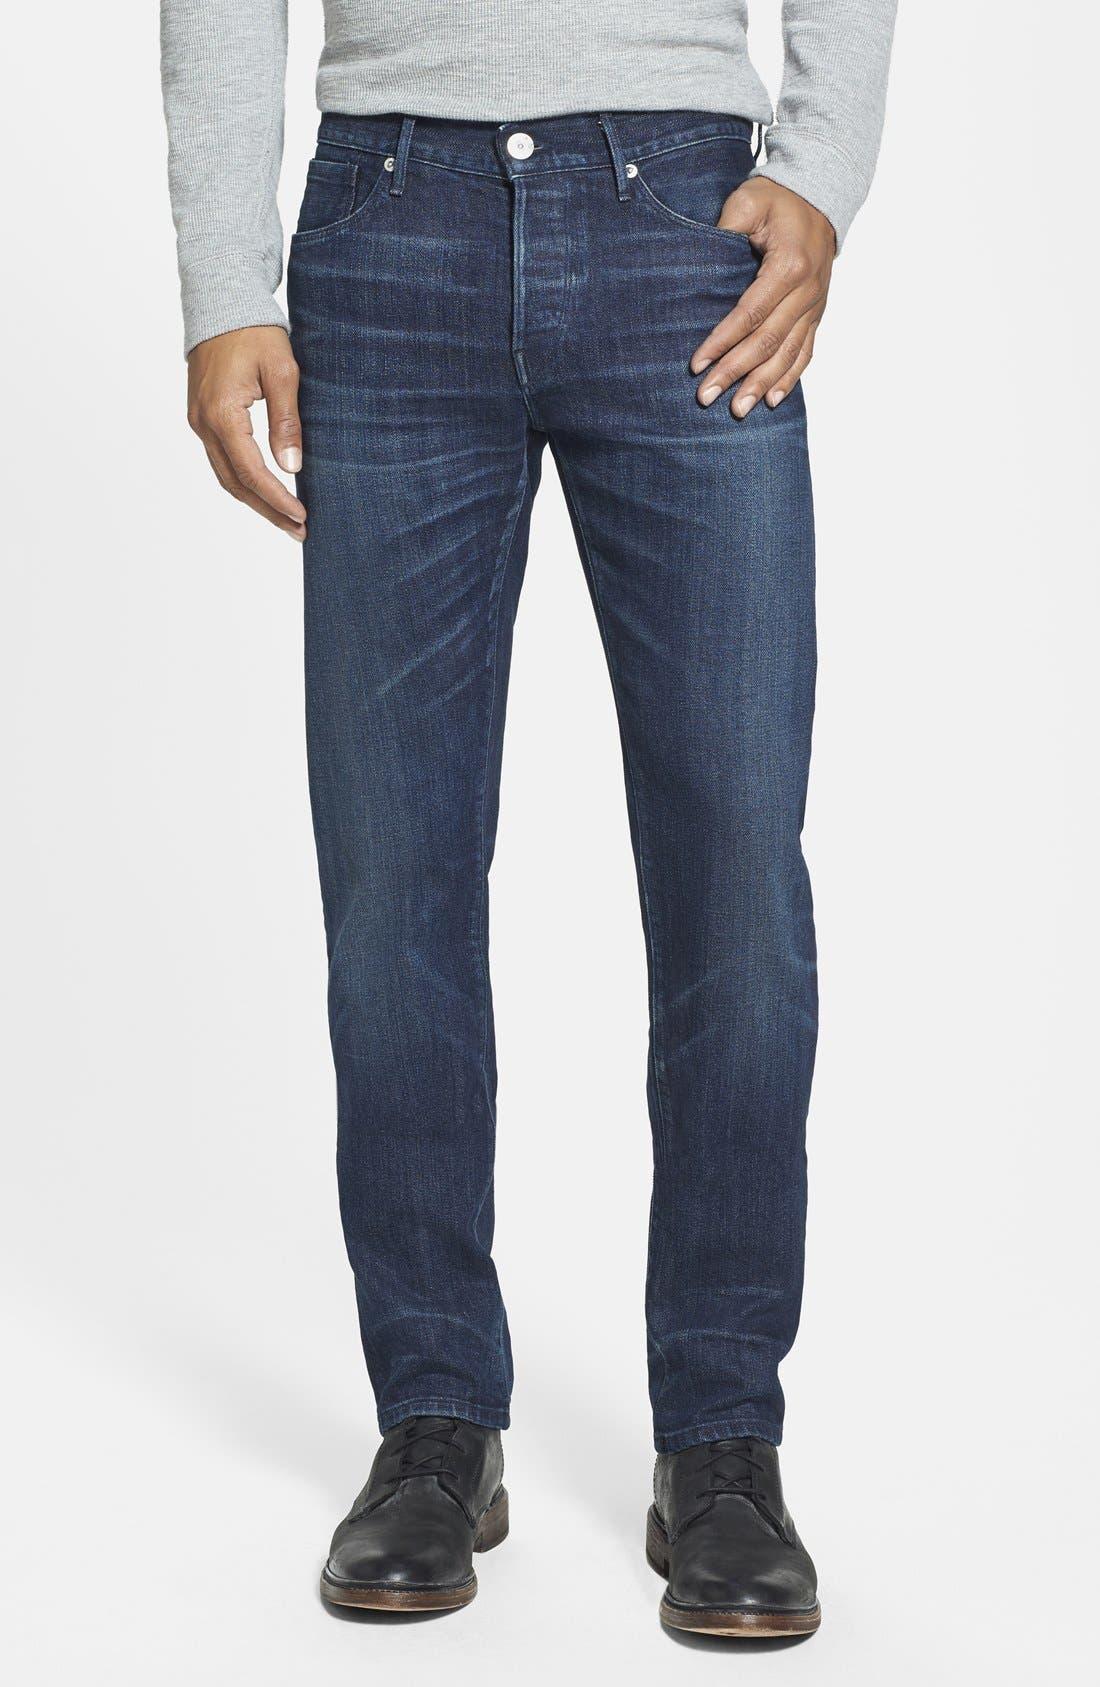 'M3' Slim Fit Selvedge Jeans,                         Main,                         color, 413